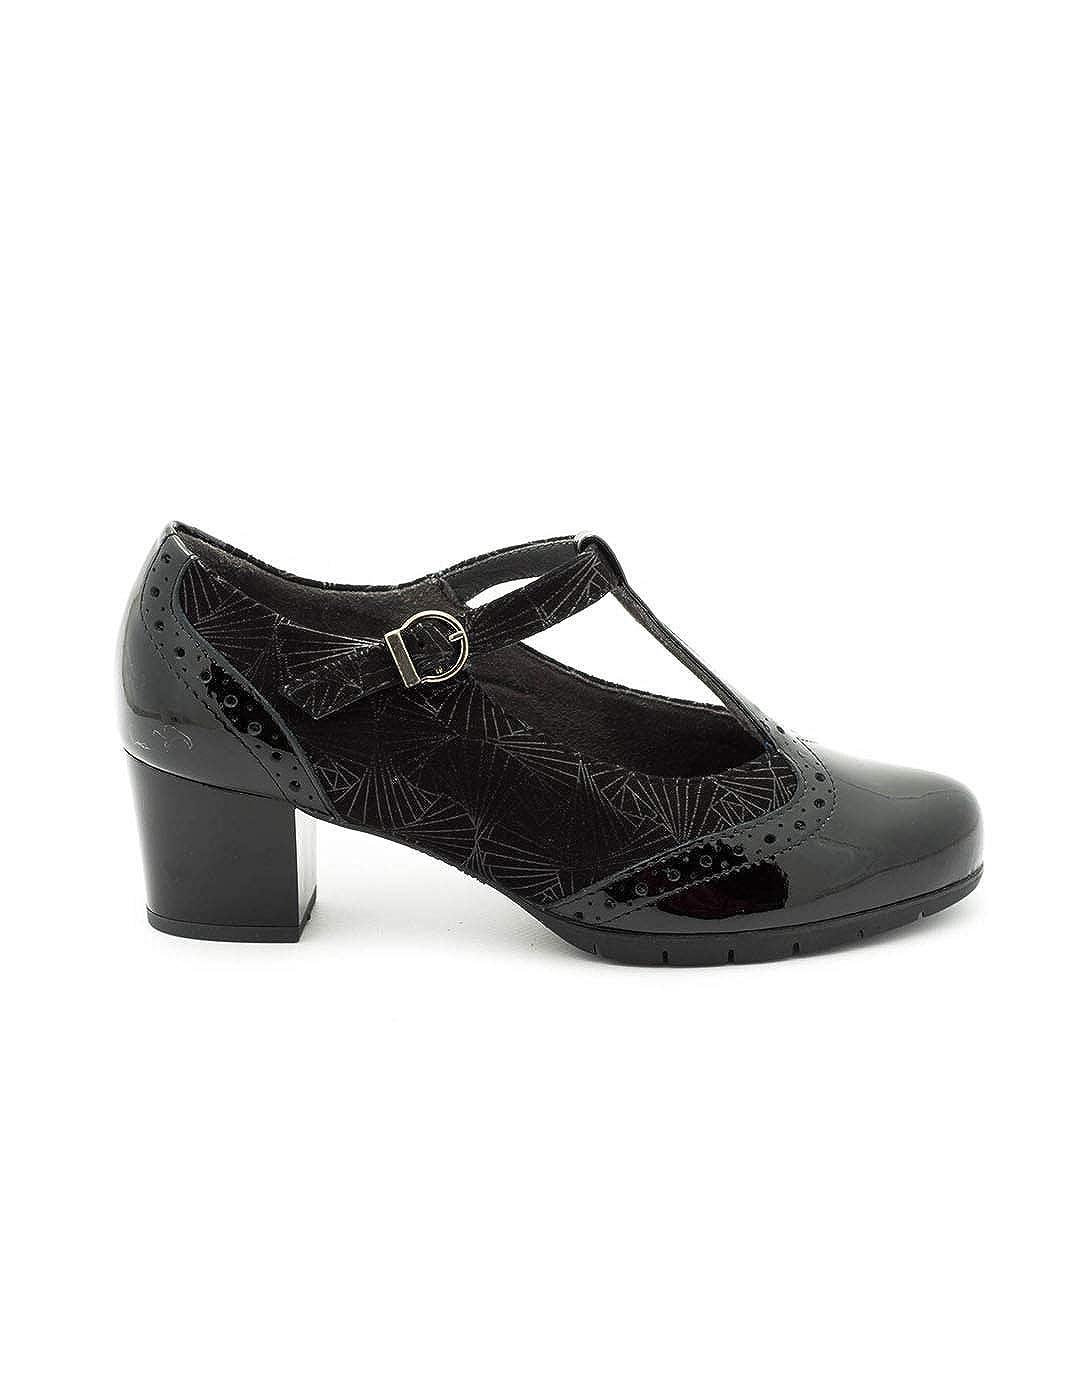 TALLA 41 EU. Zapato Pitillos De Piel Negro 5270